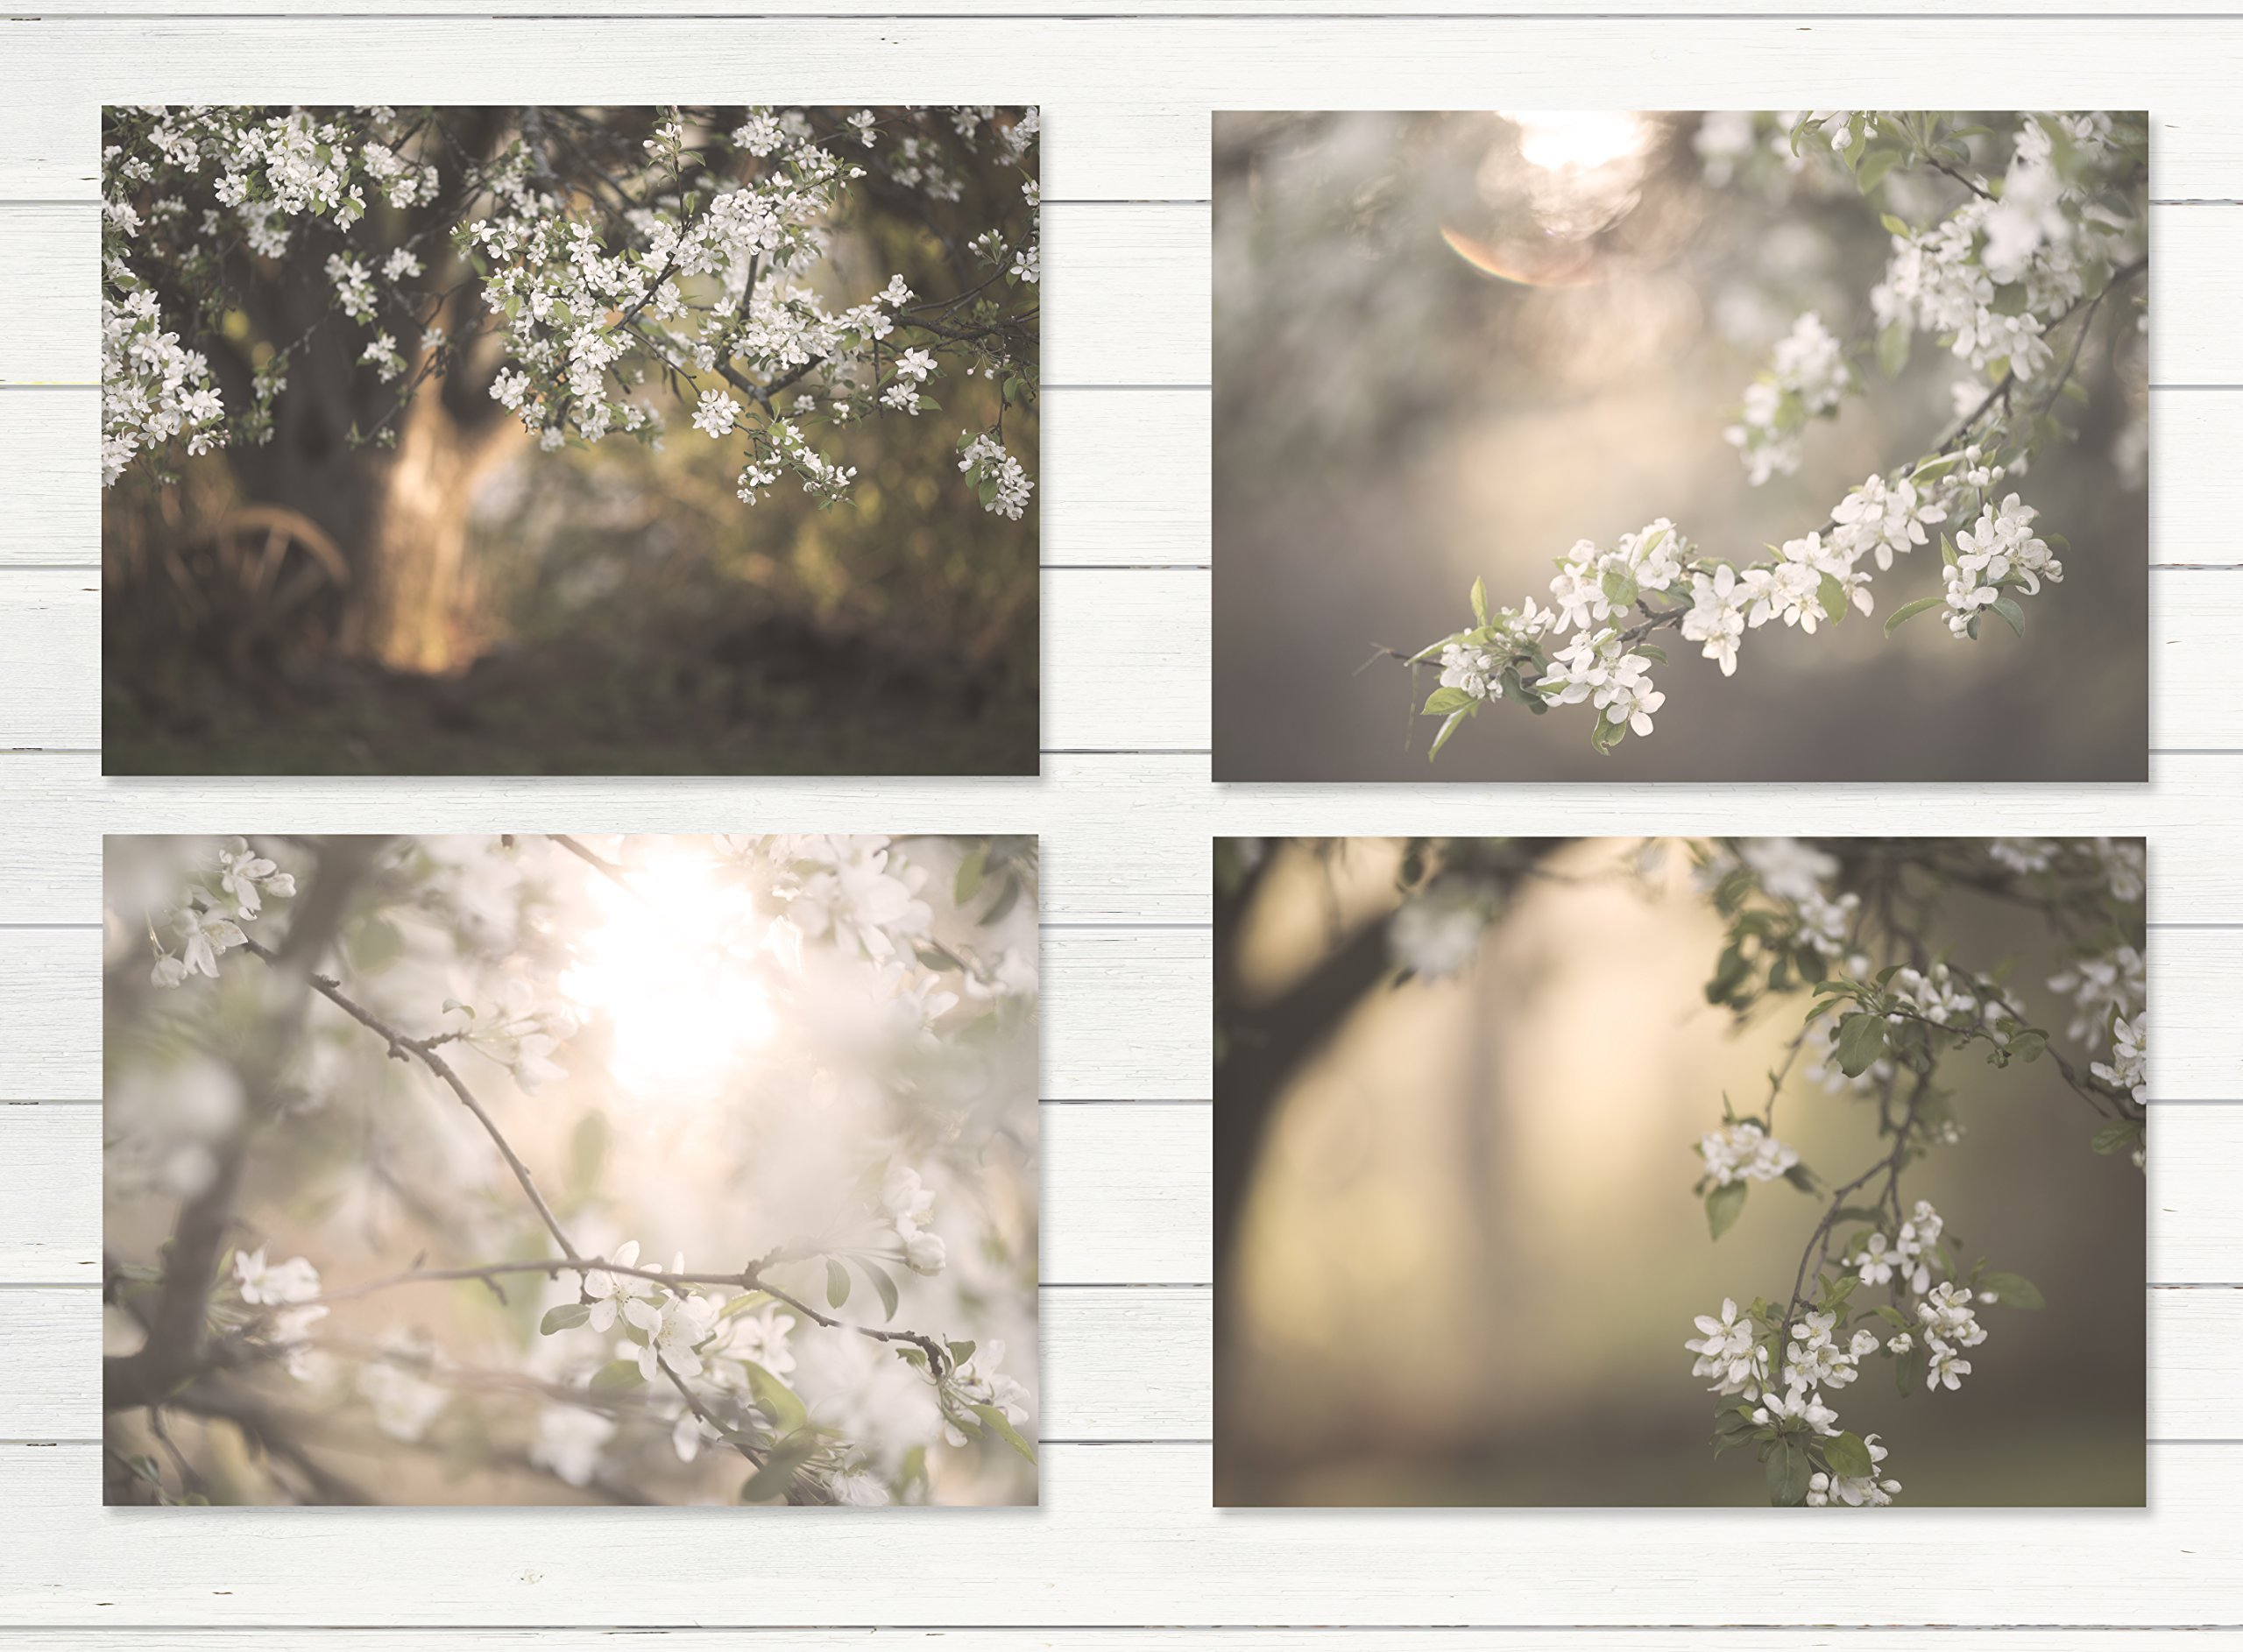 White Apple Tree Cottage Decor 4 - 8''x10'' Prints , Rustic Wall Art, Canvas, Farm Art, Fixer Upper, Floral Shabby, Bathroom, Shabby Cream, Wood Plank Photo